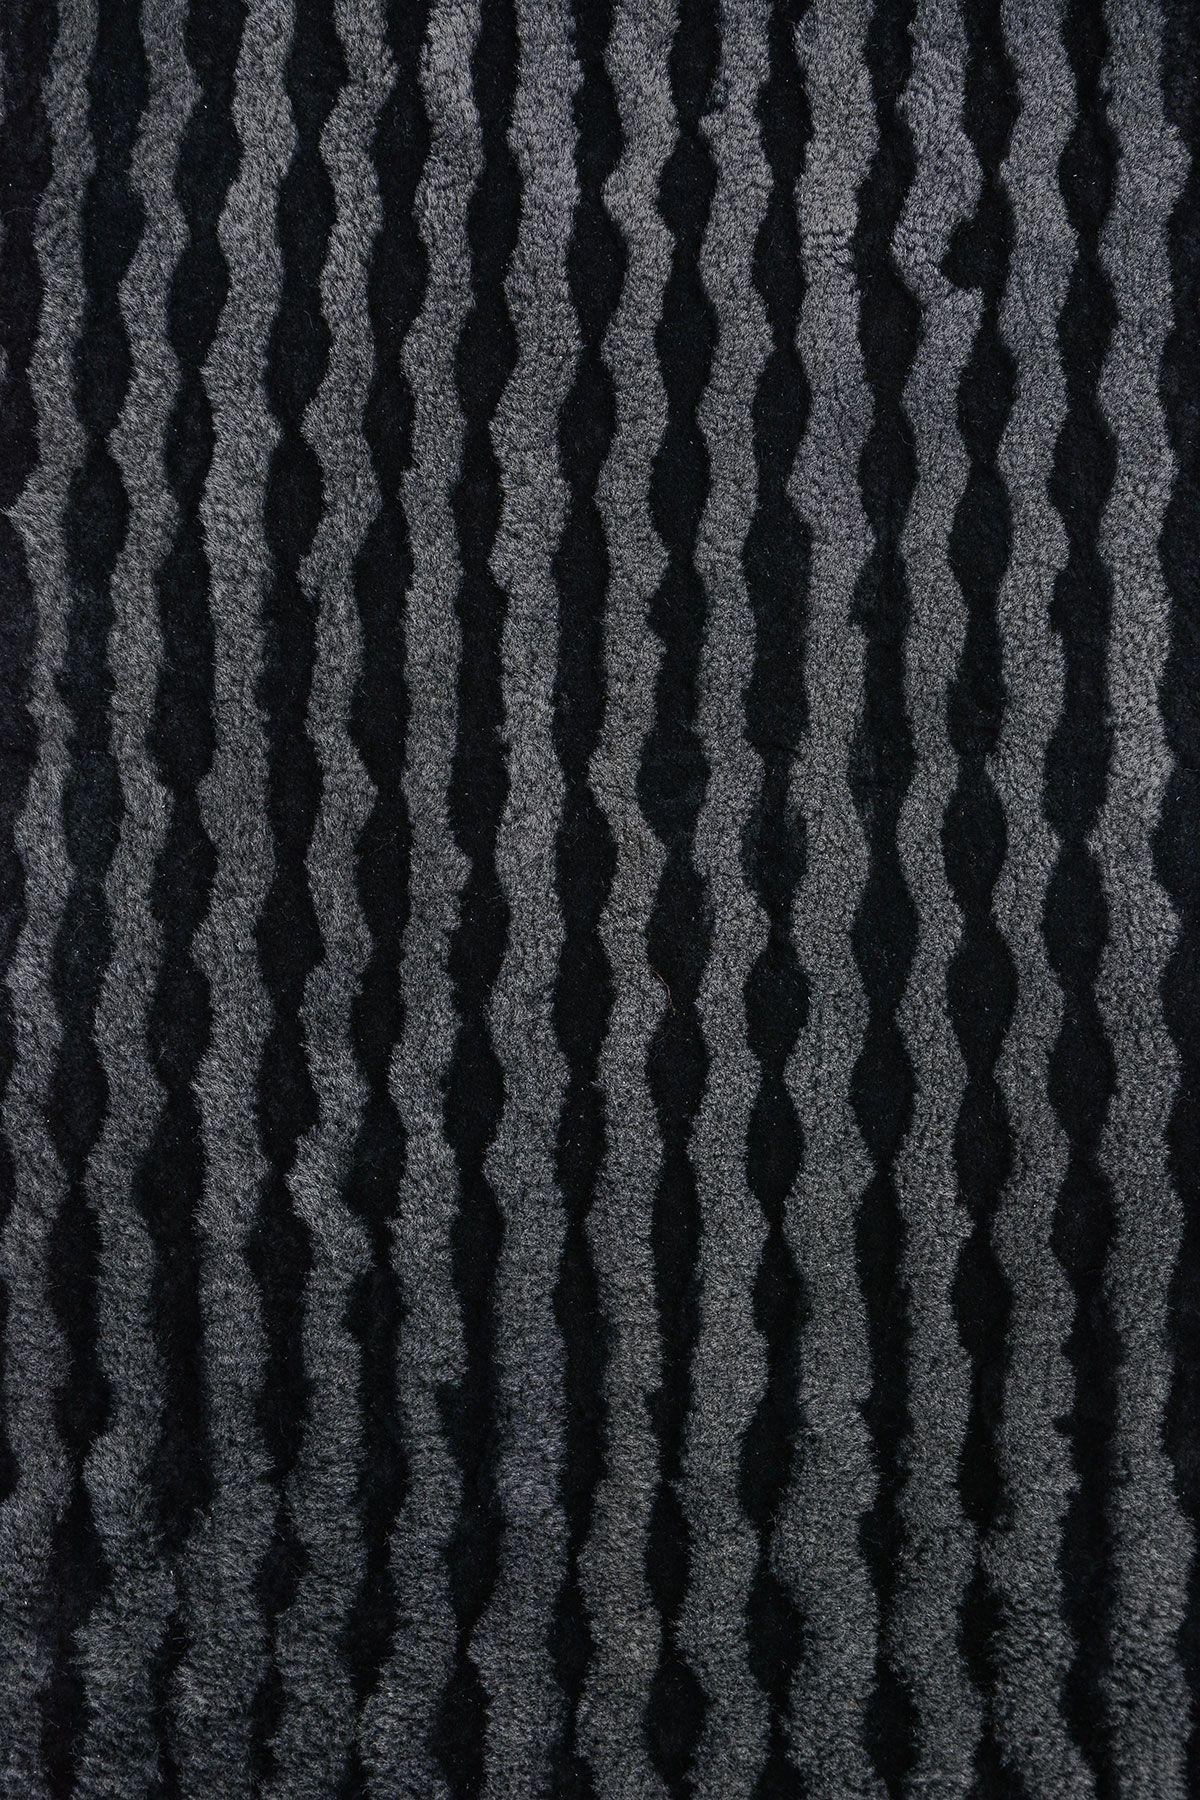 Erdoğan Deri Genuine Leather Natural Embossed Sheepskin Rug DKR061 Black